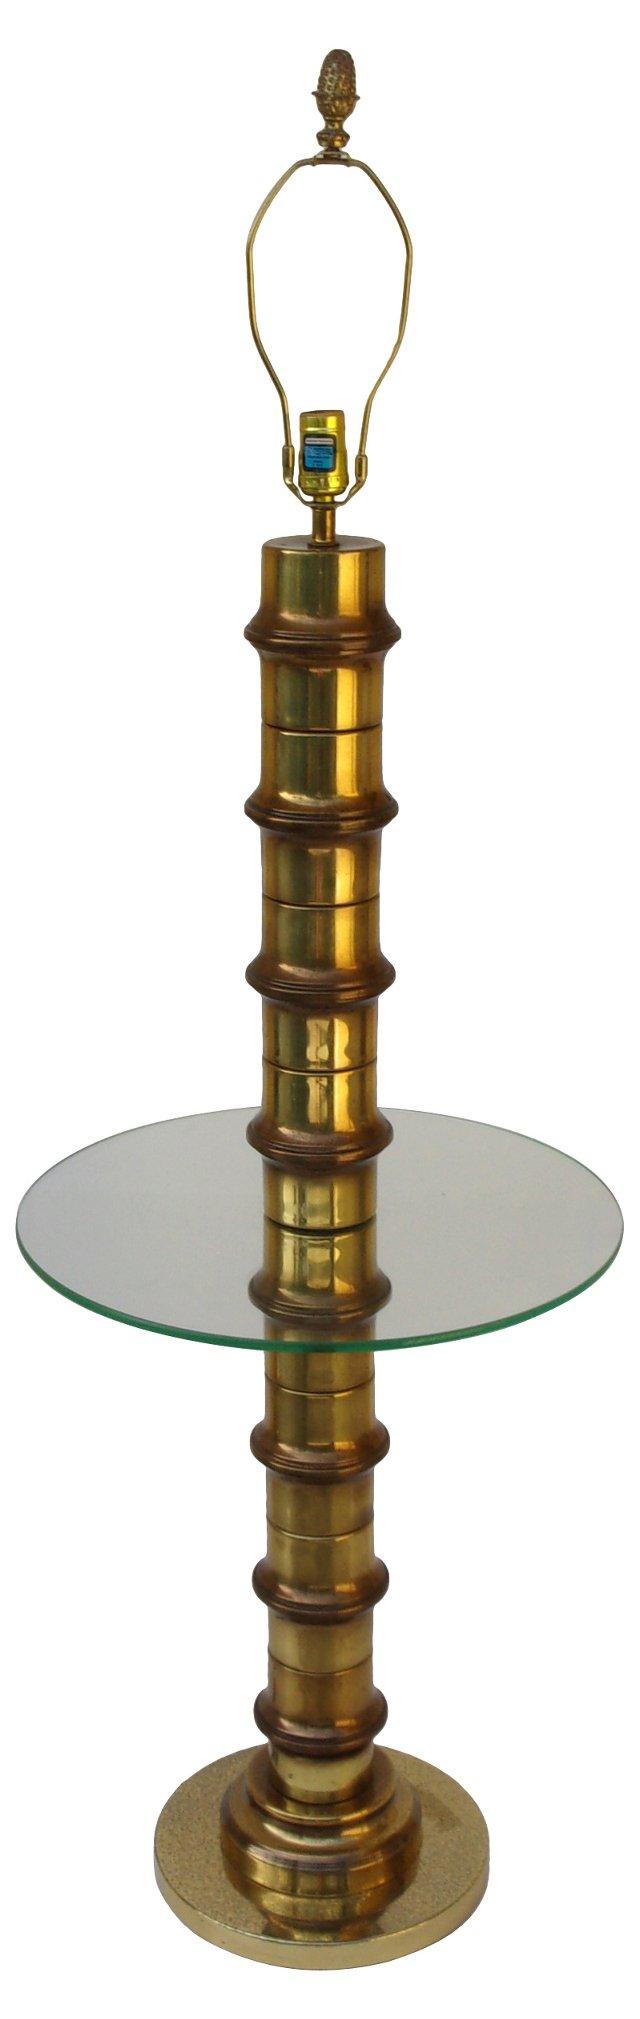 Mastercraft Bamboo-Style Floor Lamp